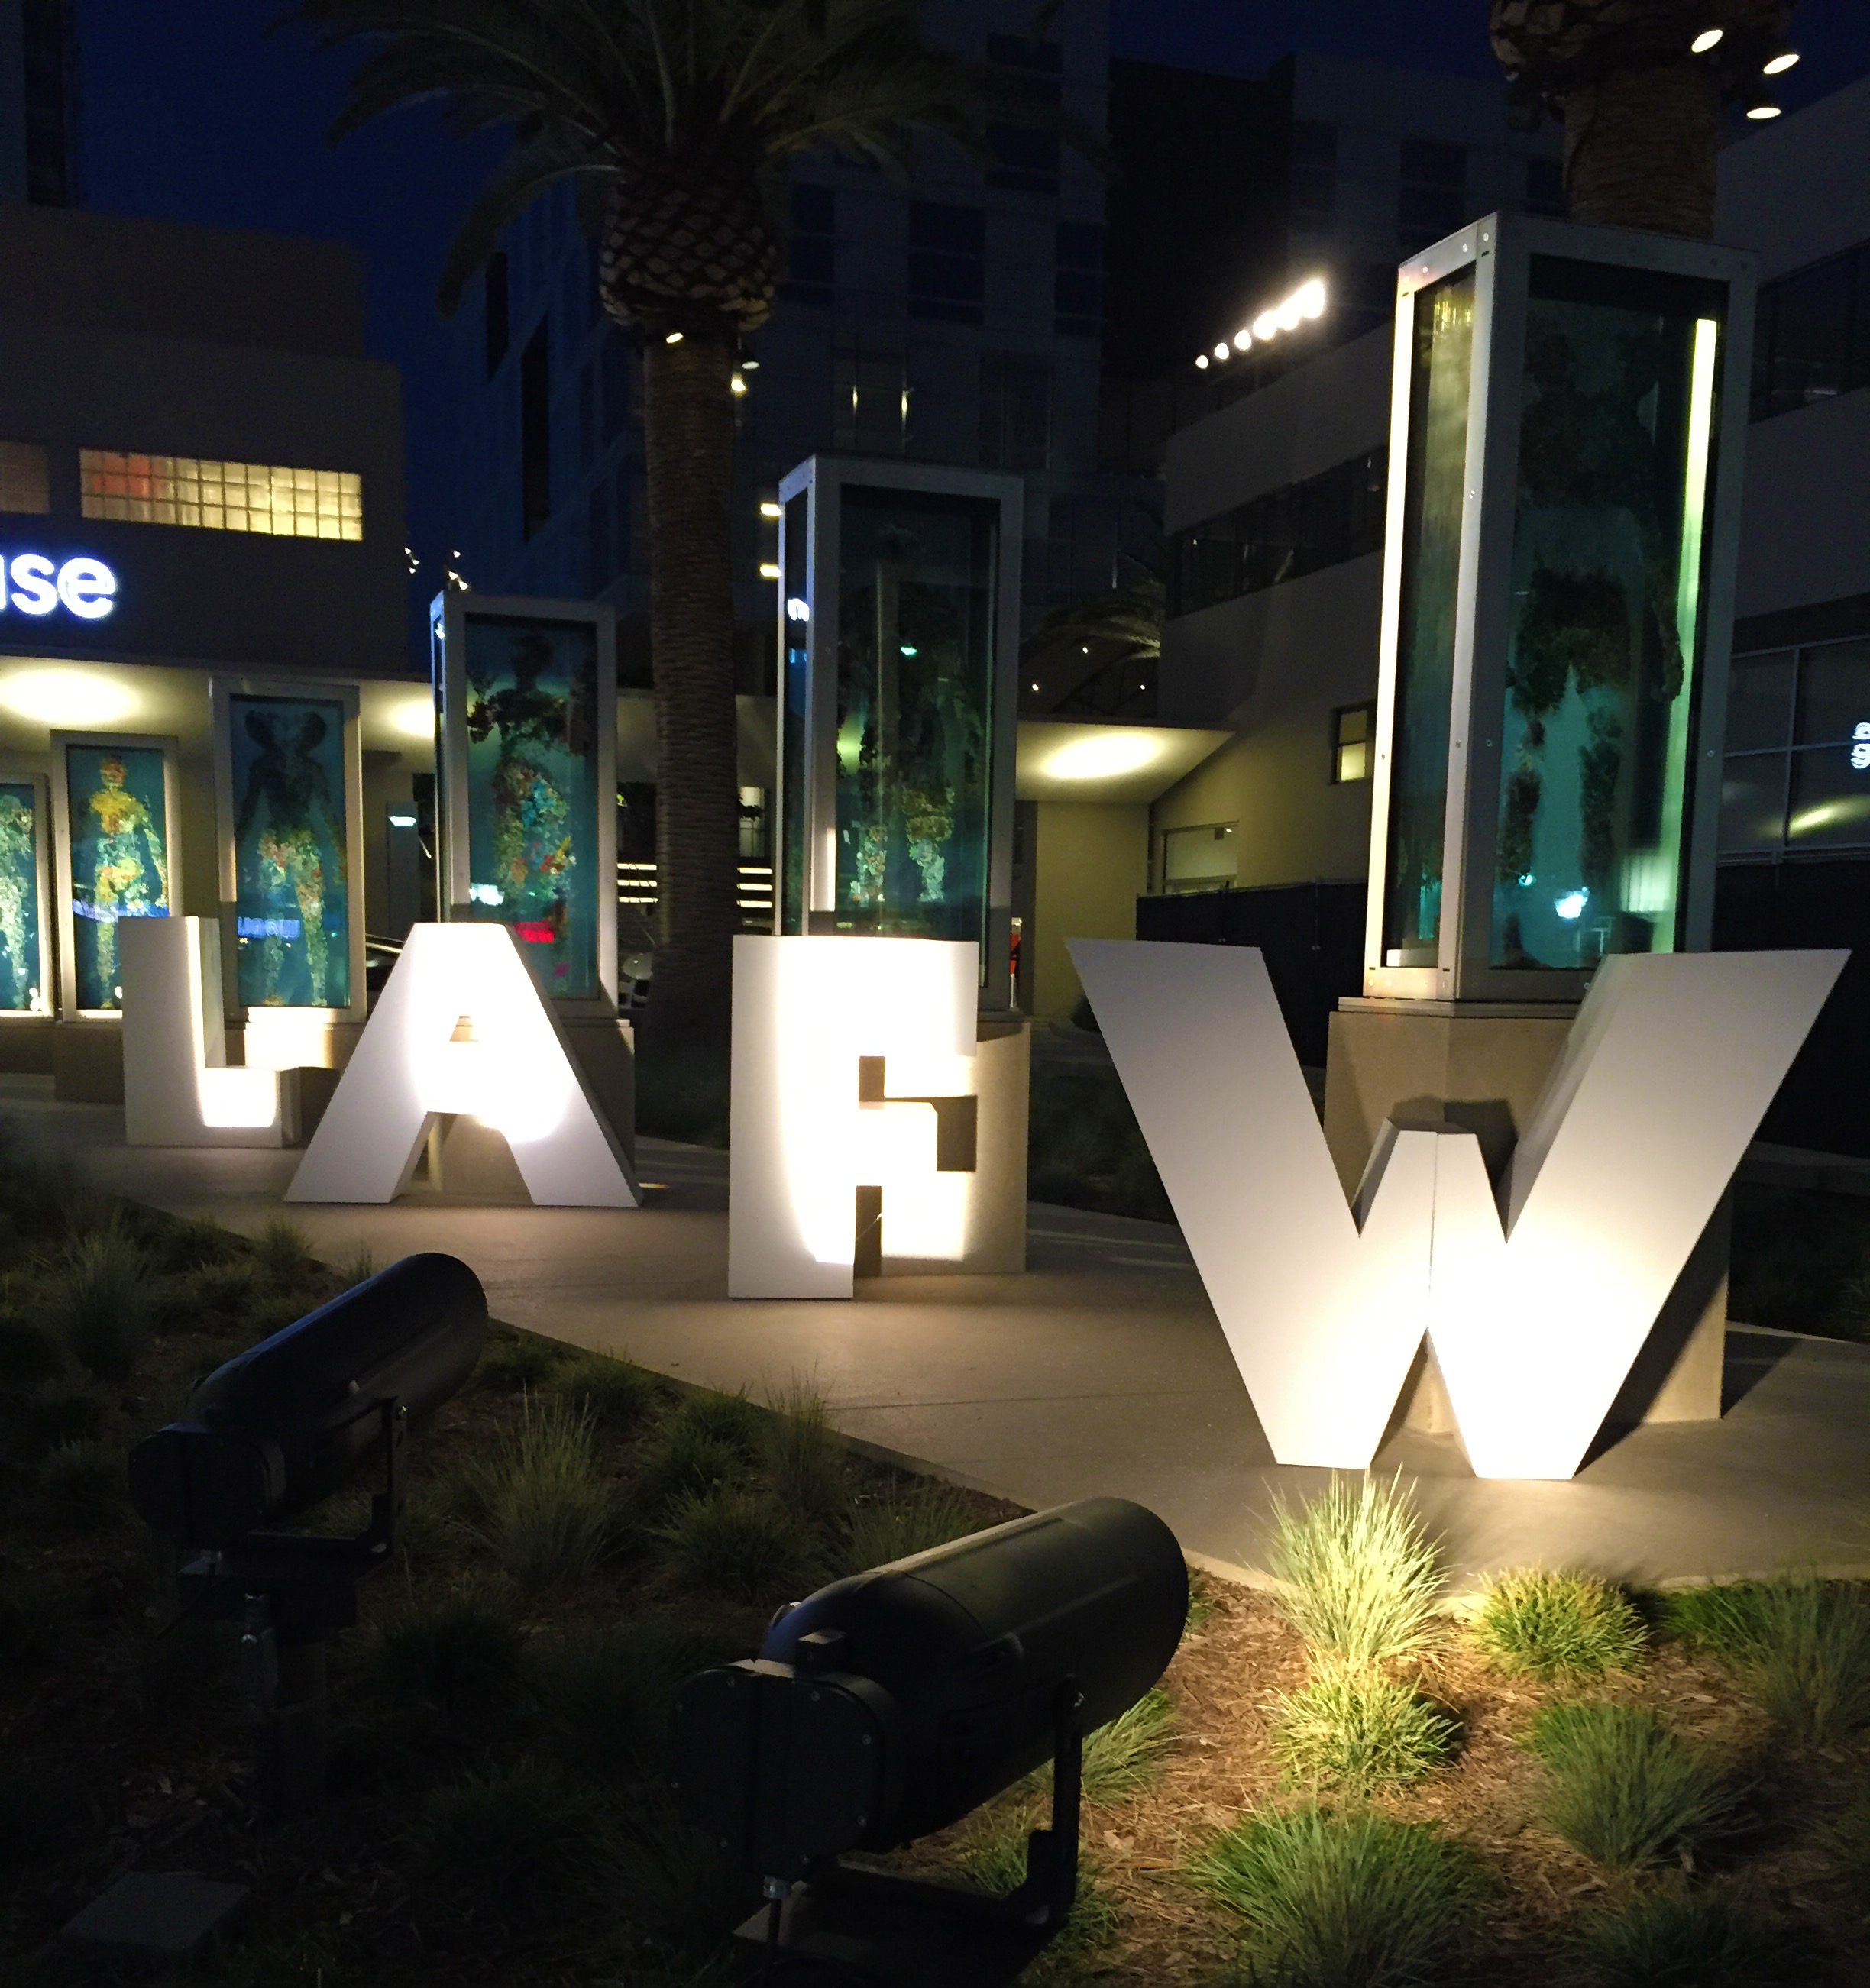 LA Fashion Week - Hamptons to Hollywood 2016